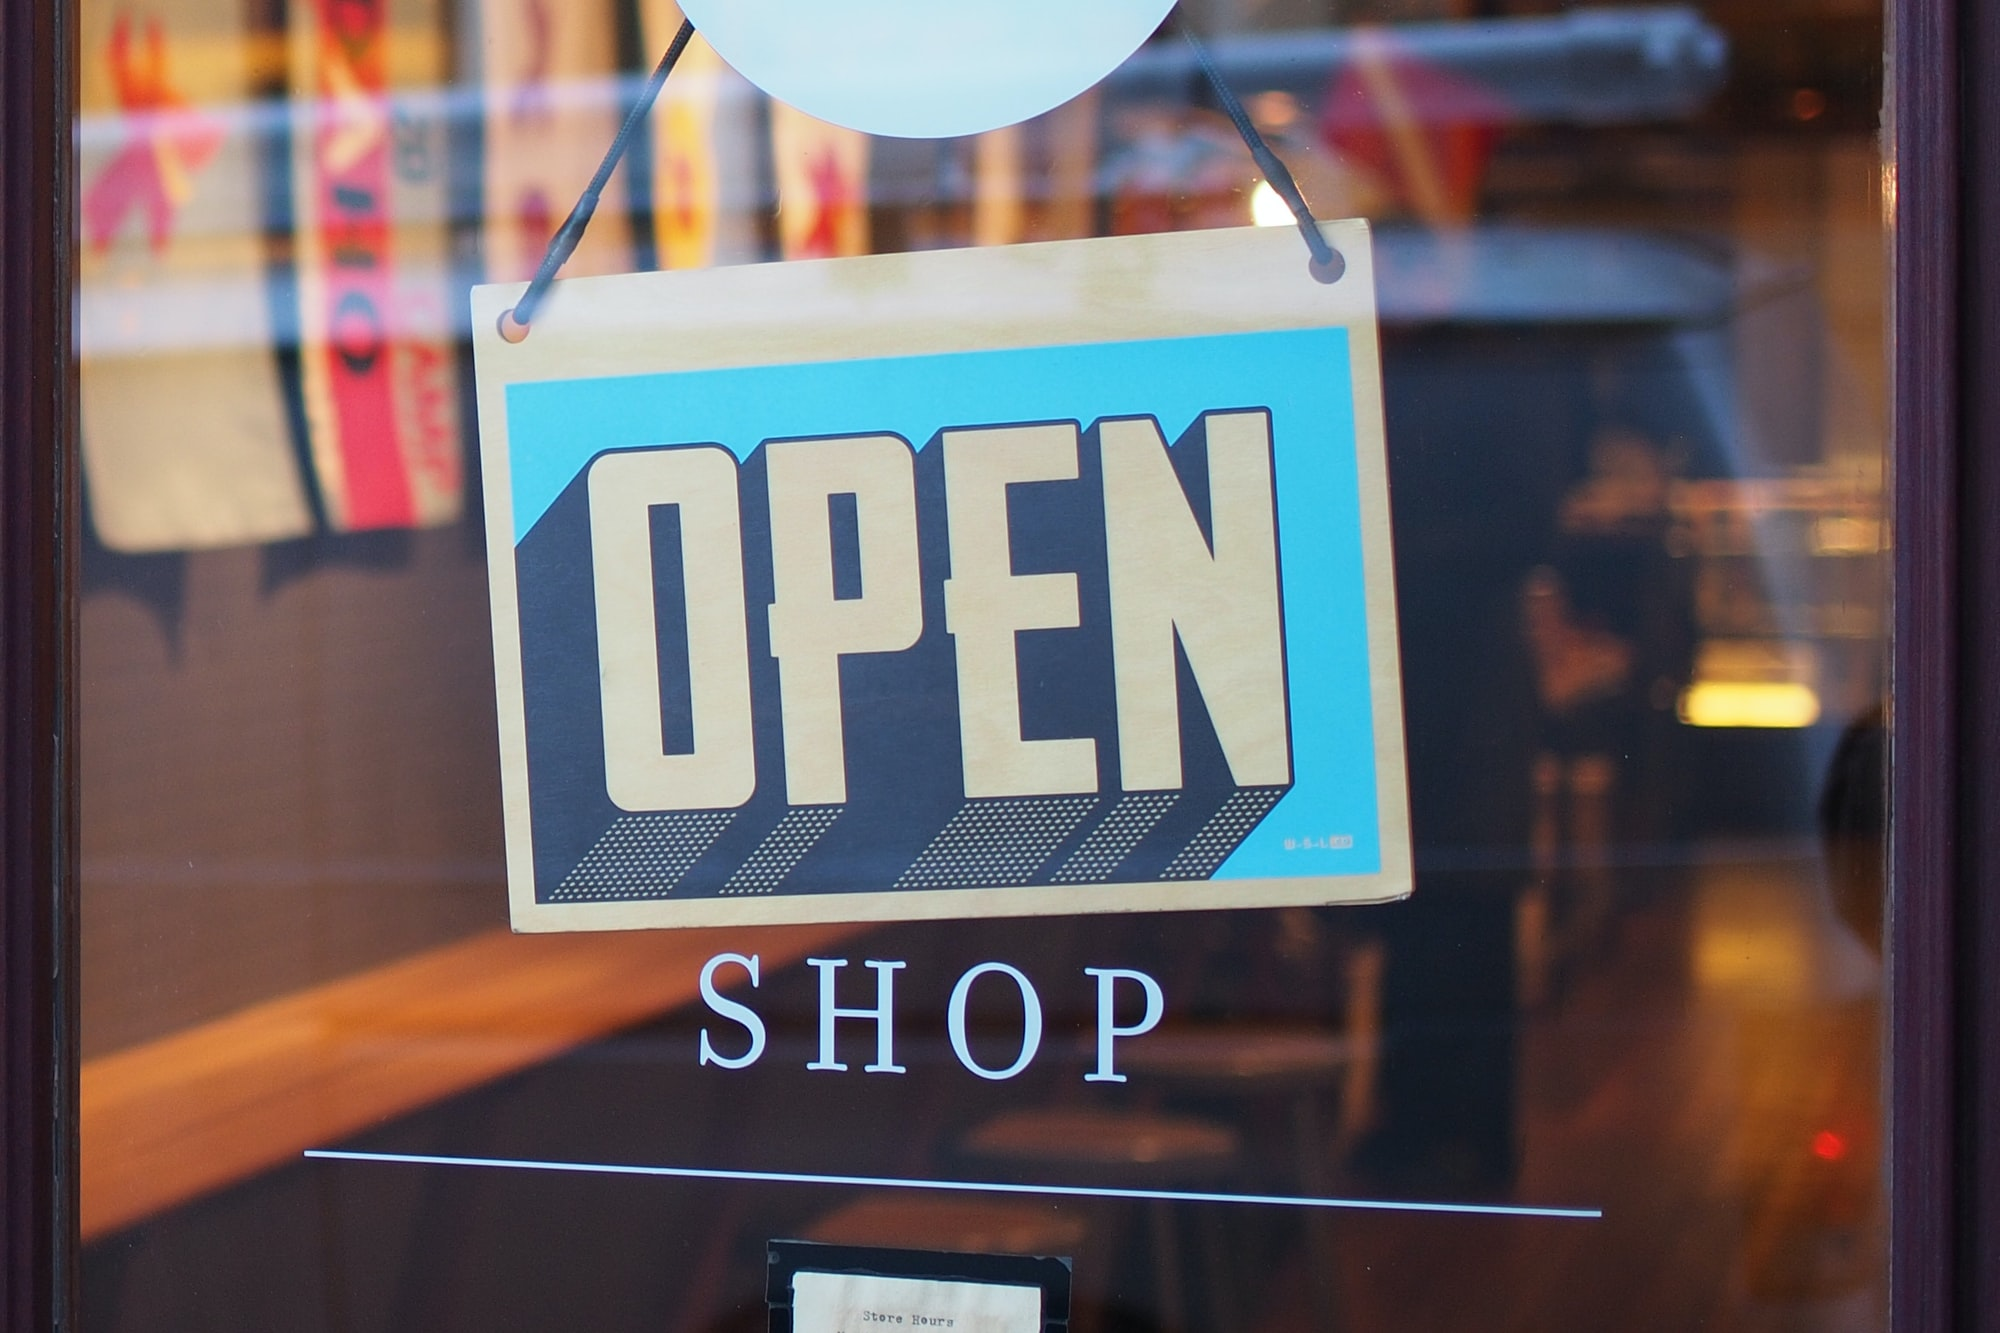 Shopifyのローカル開発環境を準備する(Mac)